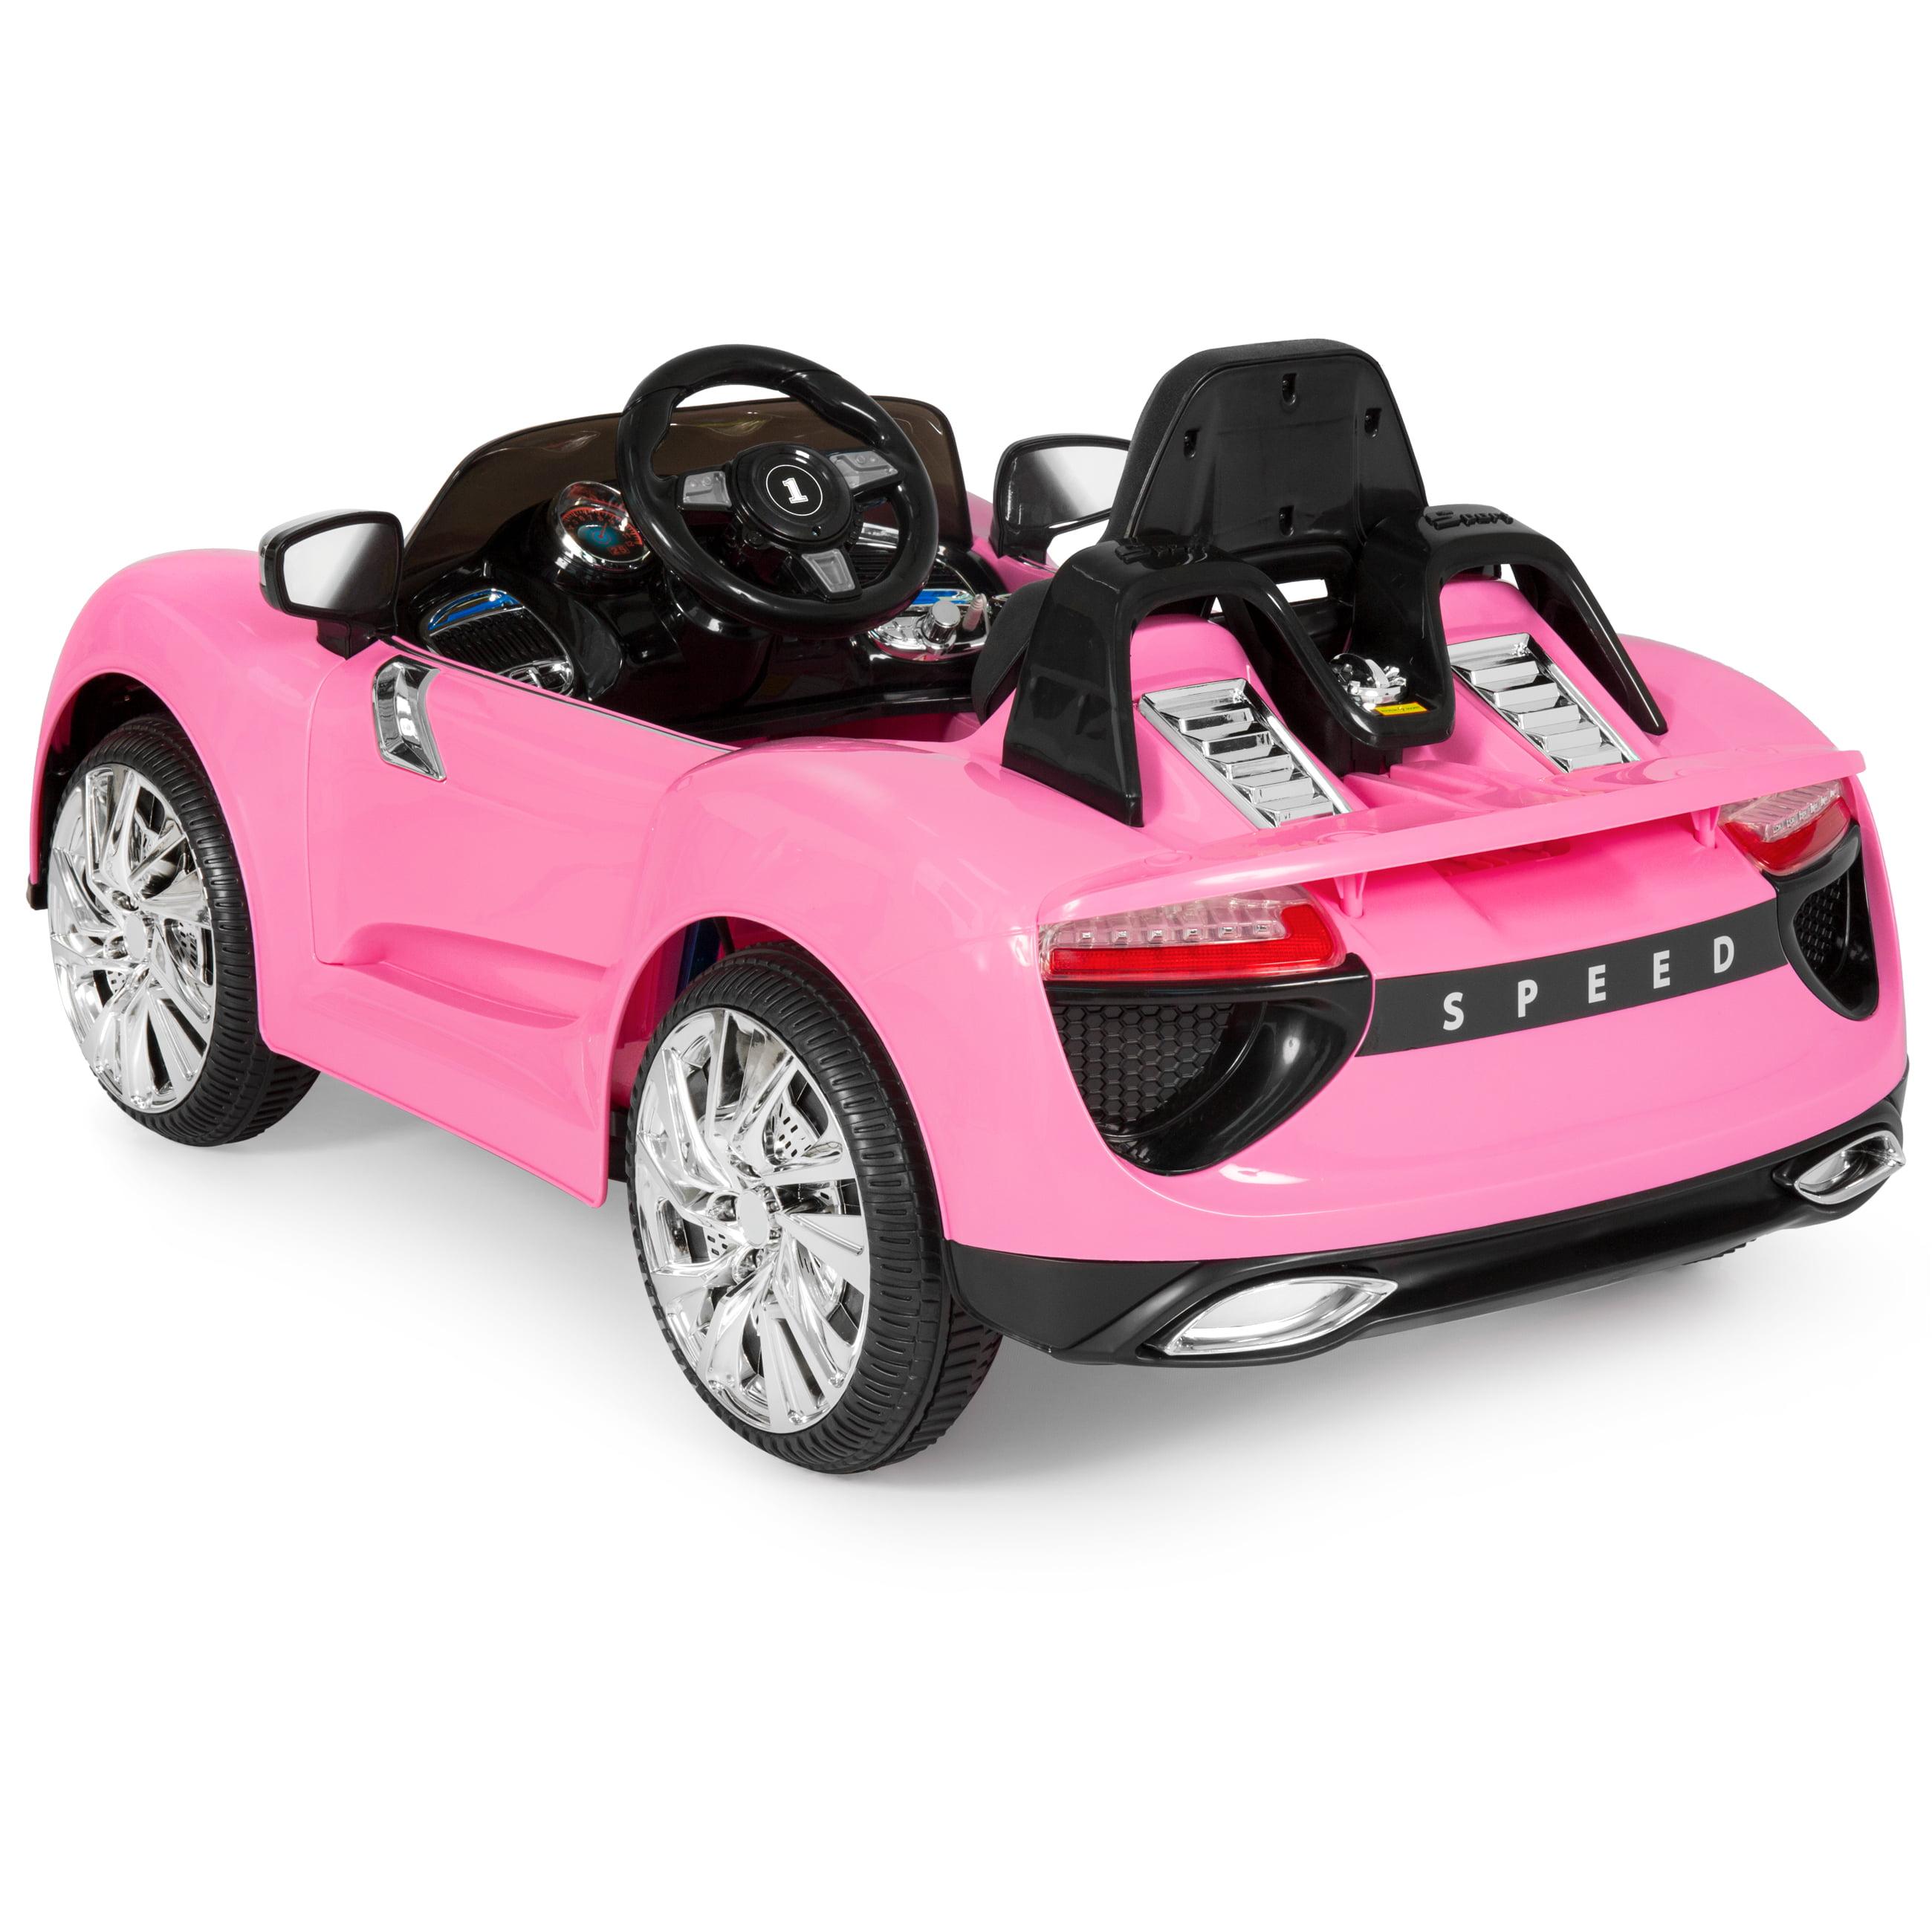 Fabulous pink audi power wheels aratorn sport cars for Pink mercedes benz power wheels